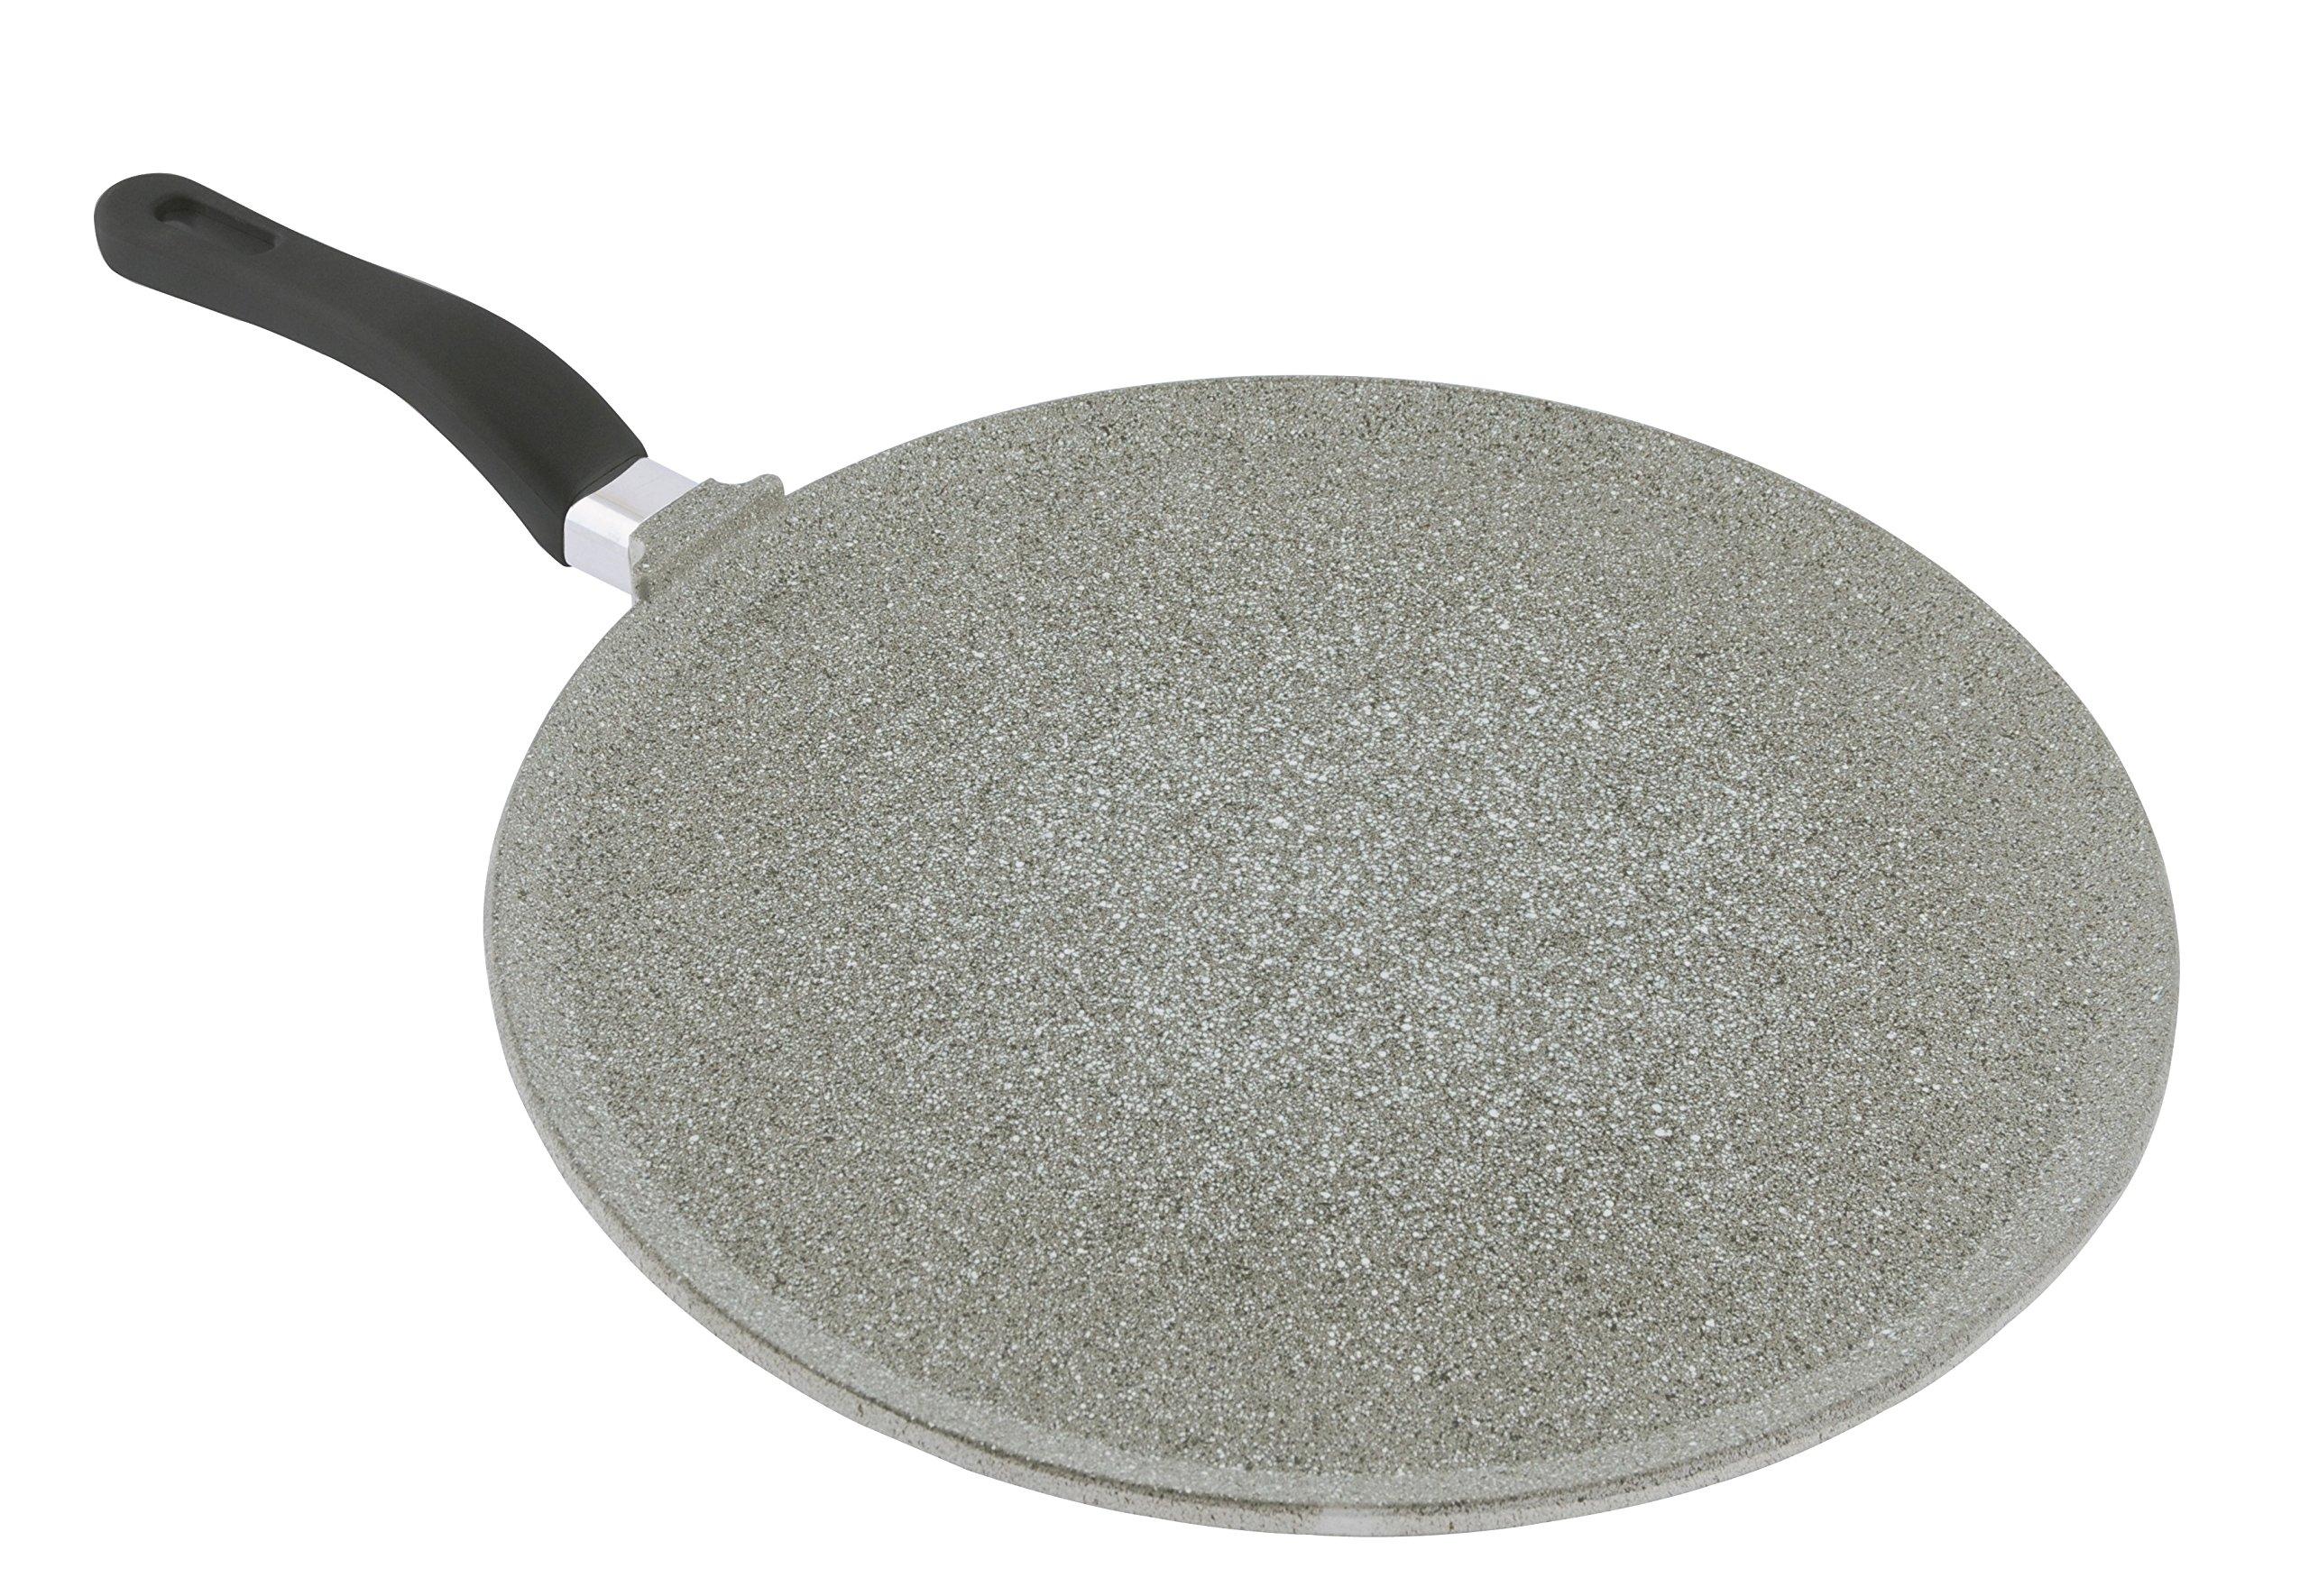 Mopita 28cm/11'' Non-Stick Cast Aluminum Crepe Pan, Medium, Grey by Mopita